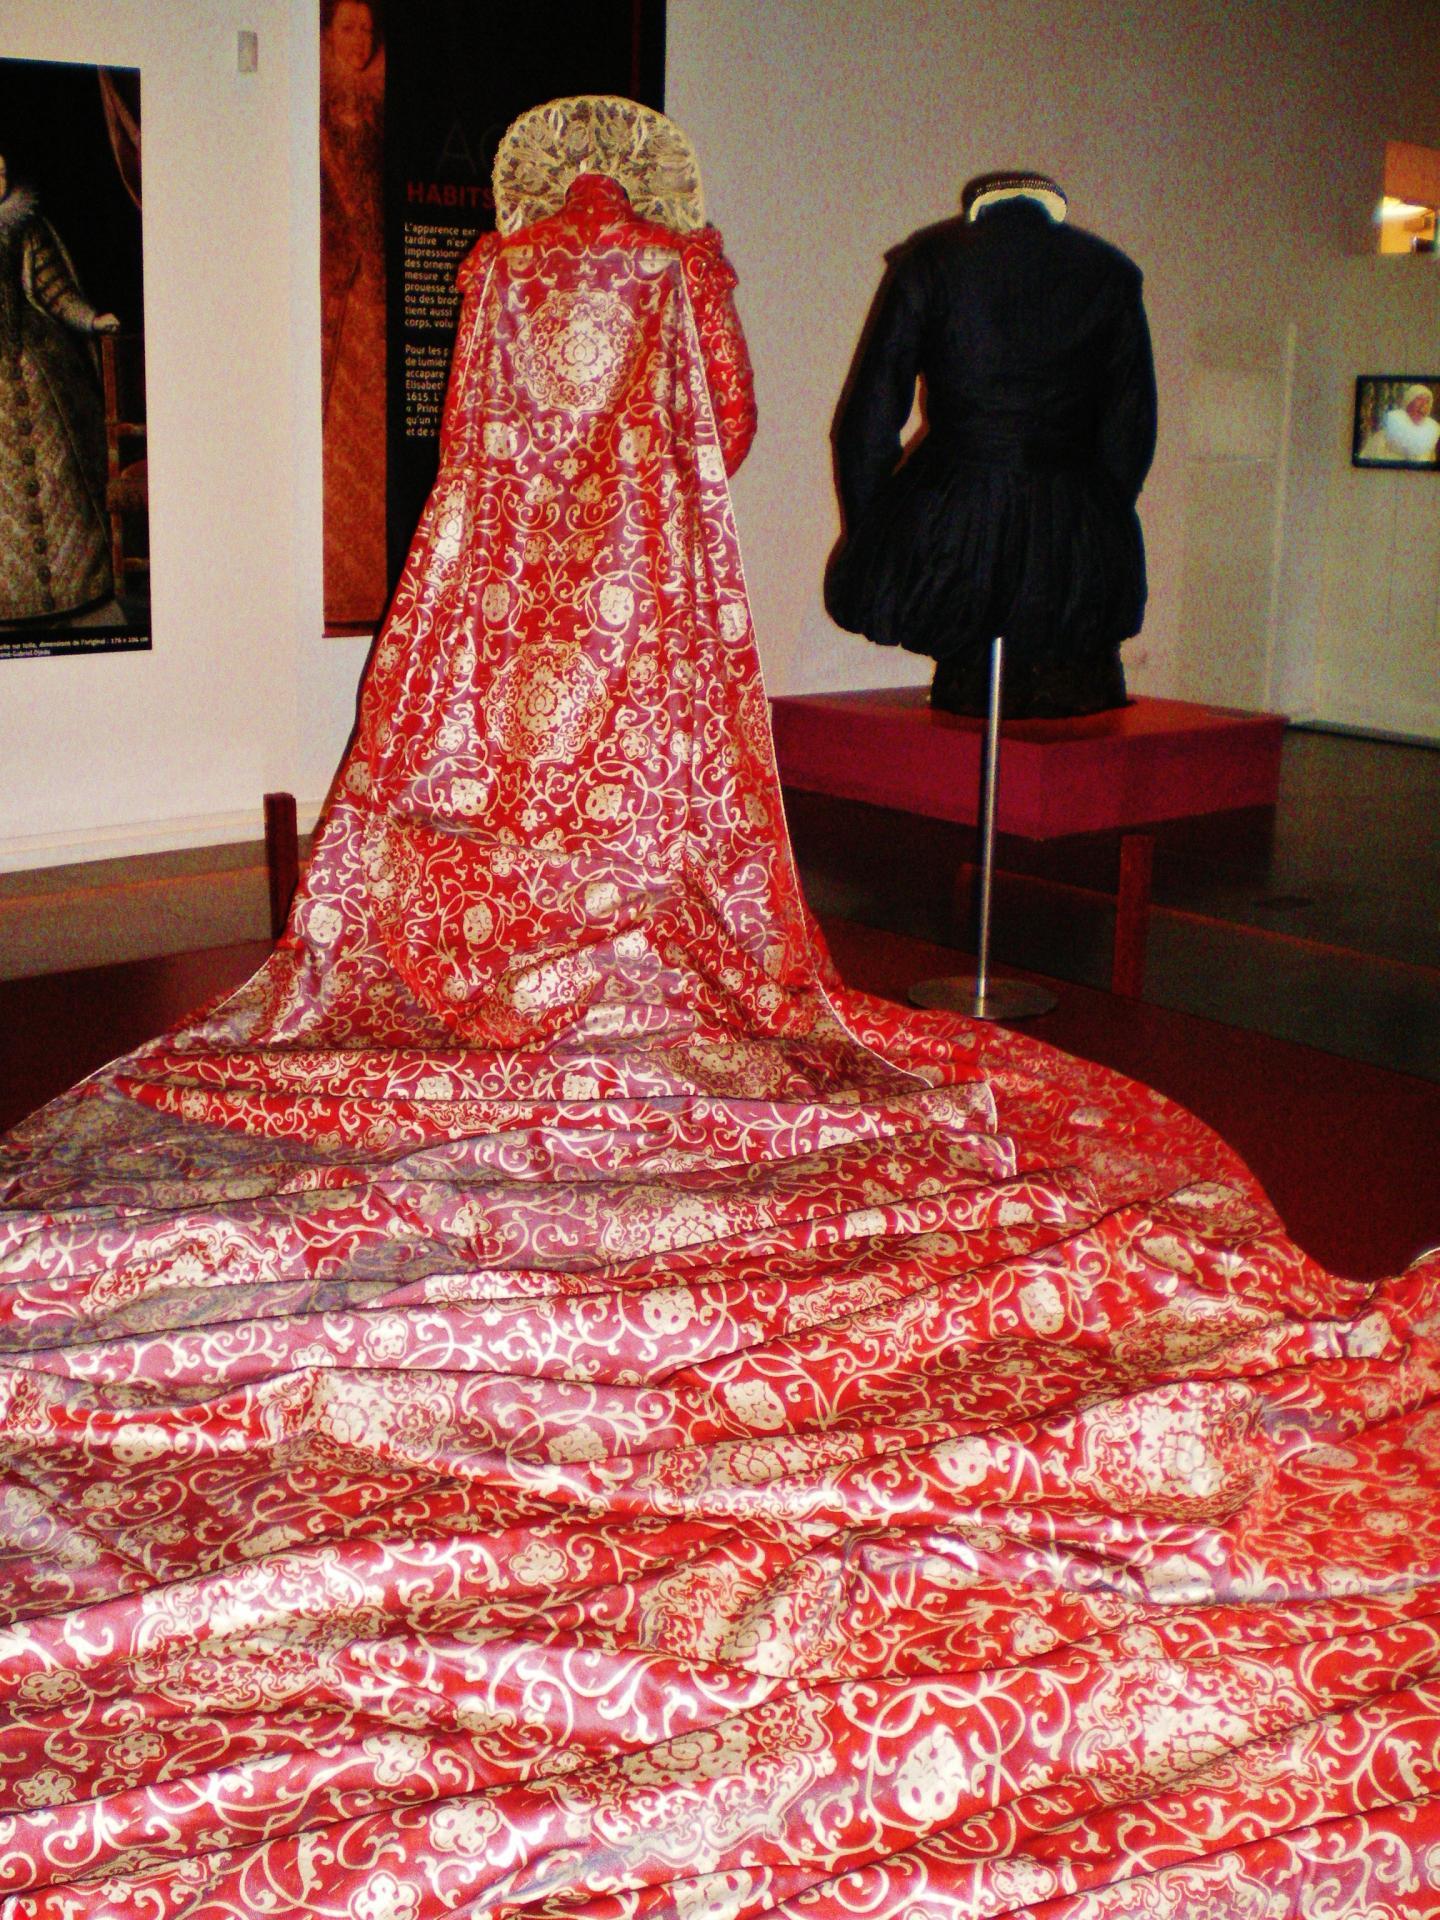 Isabelle Adjani robe de la Reine Margot